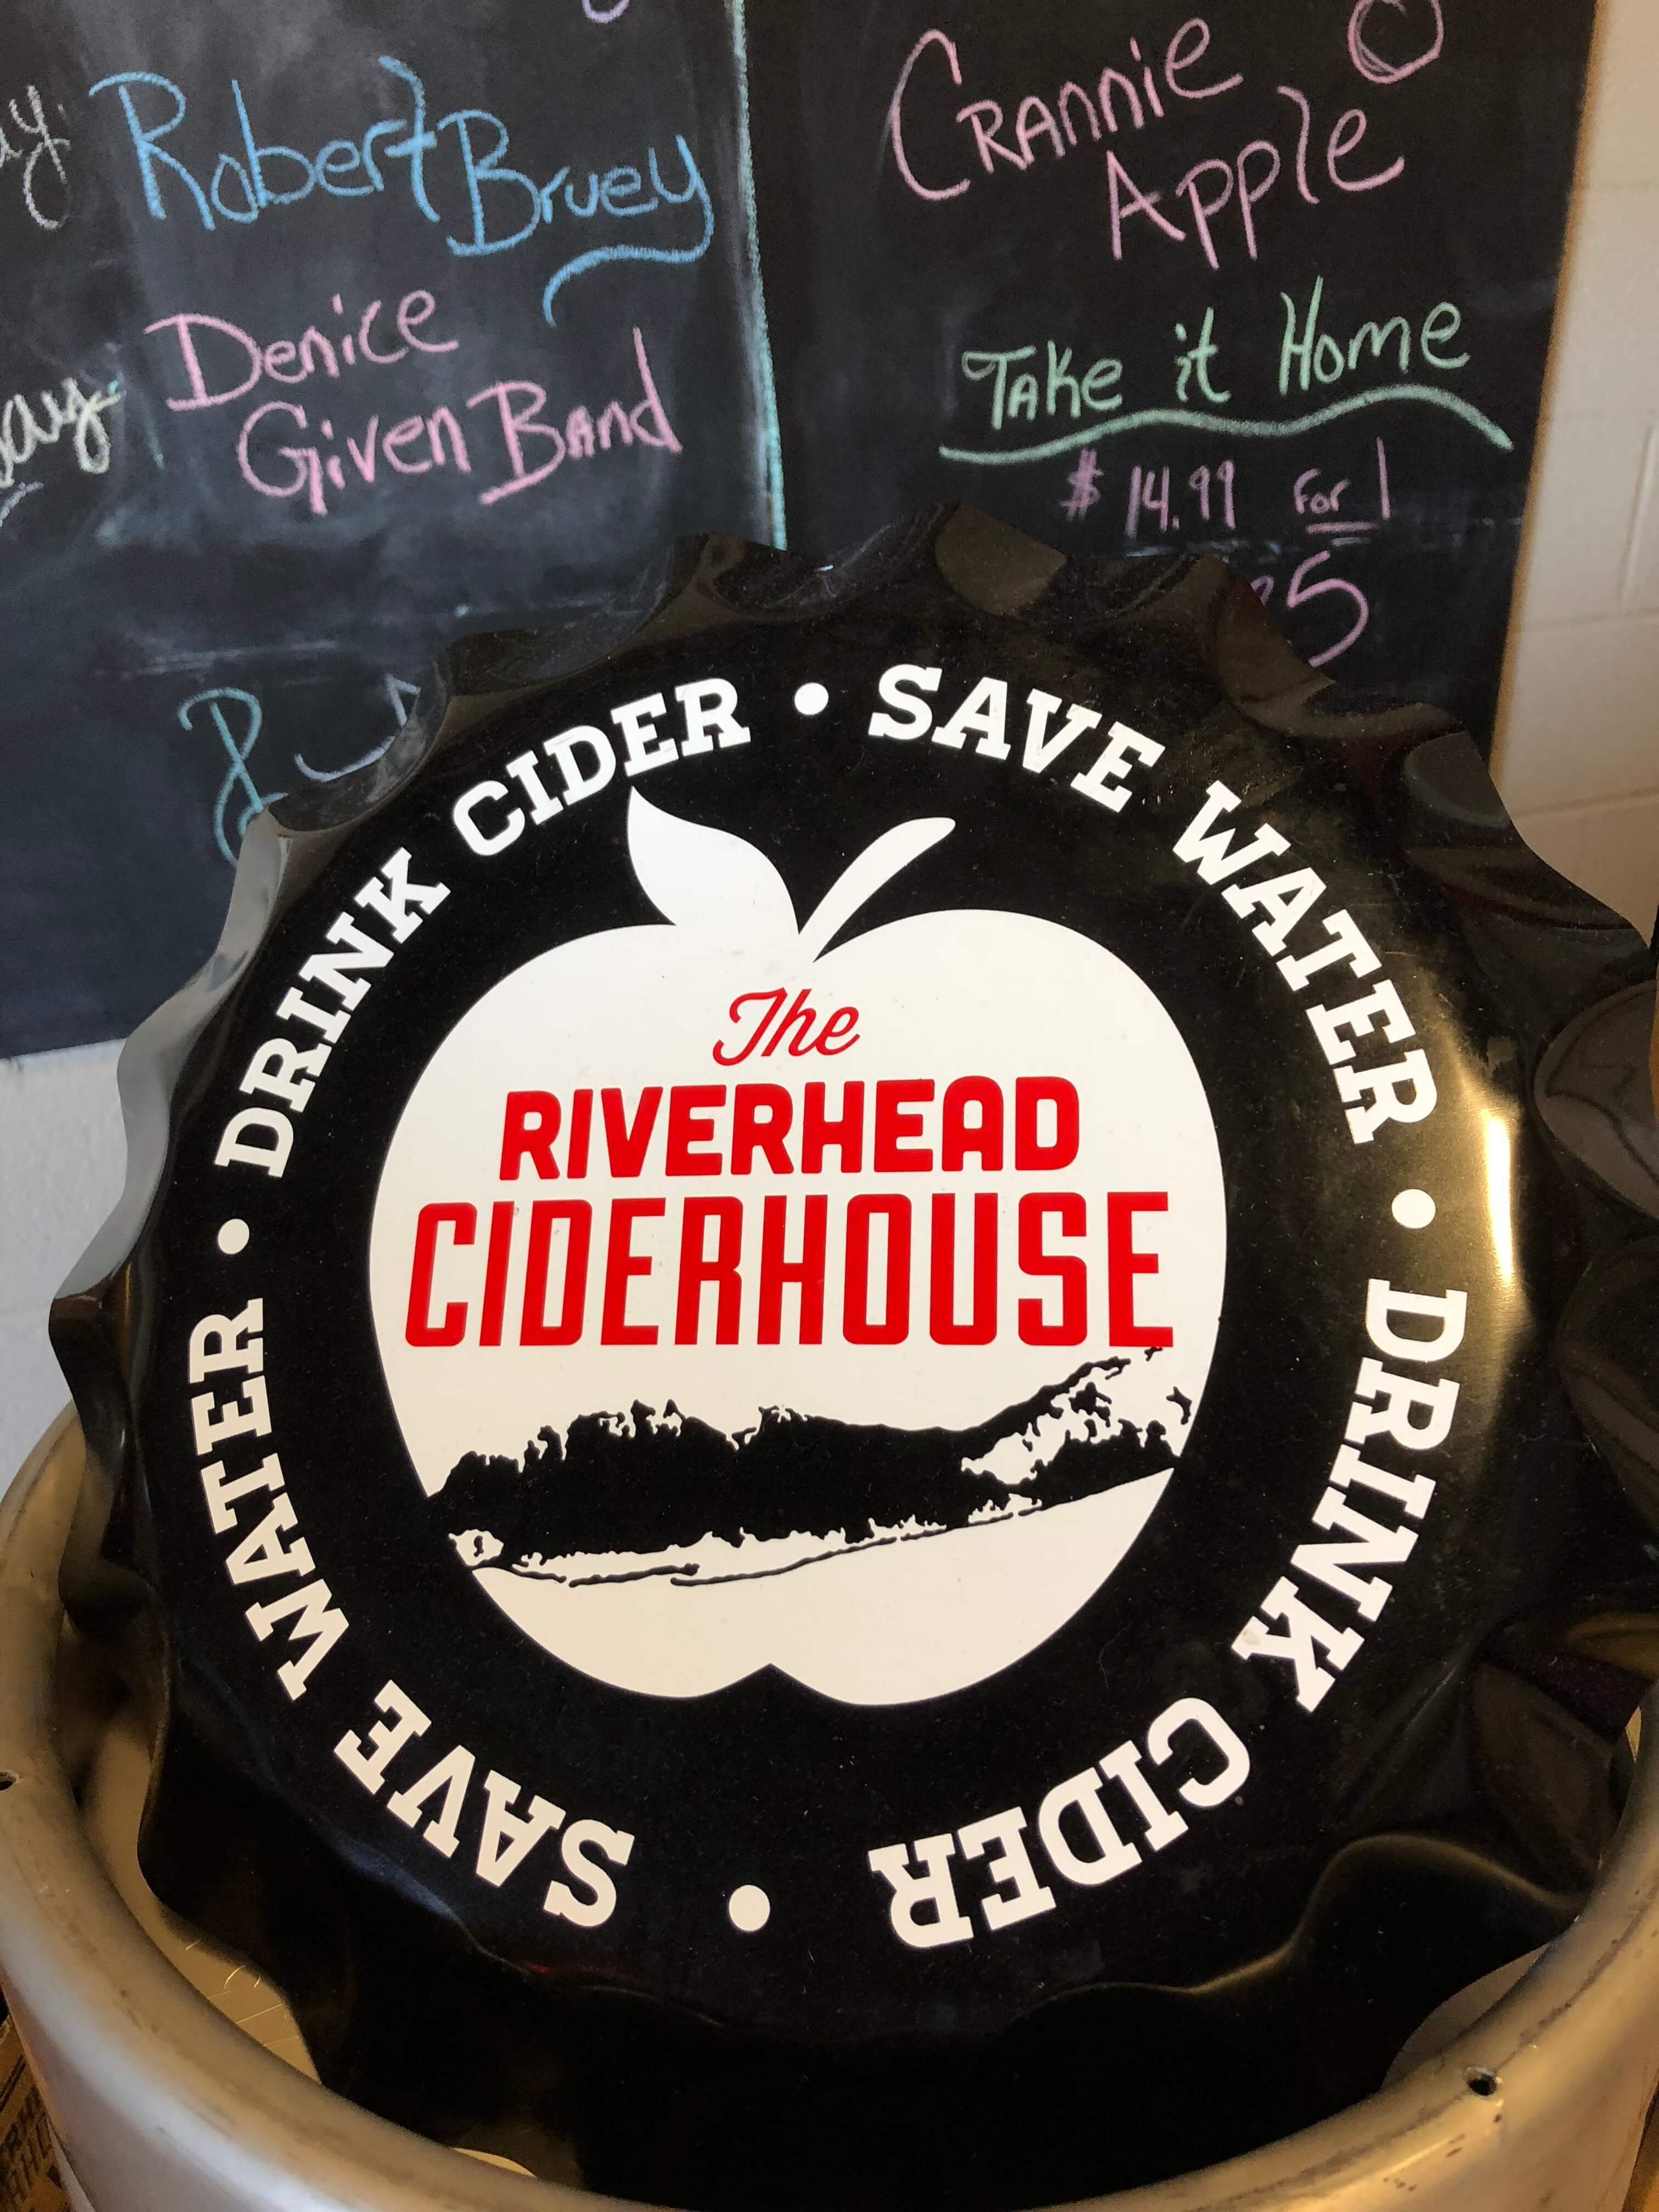 The Riverhead Ciderhouse north fork